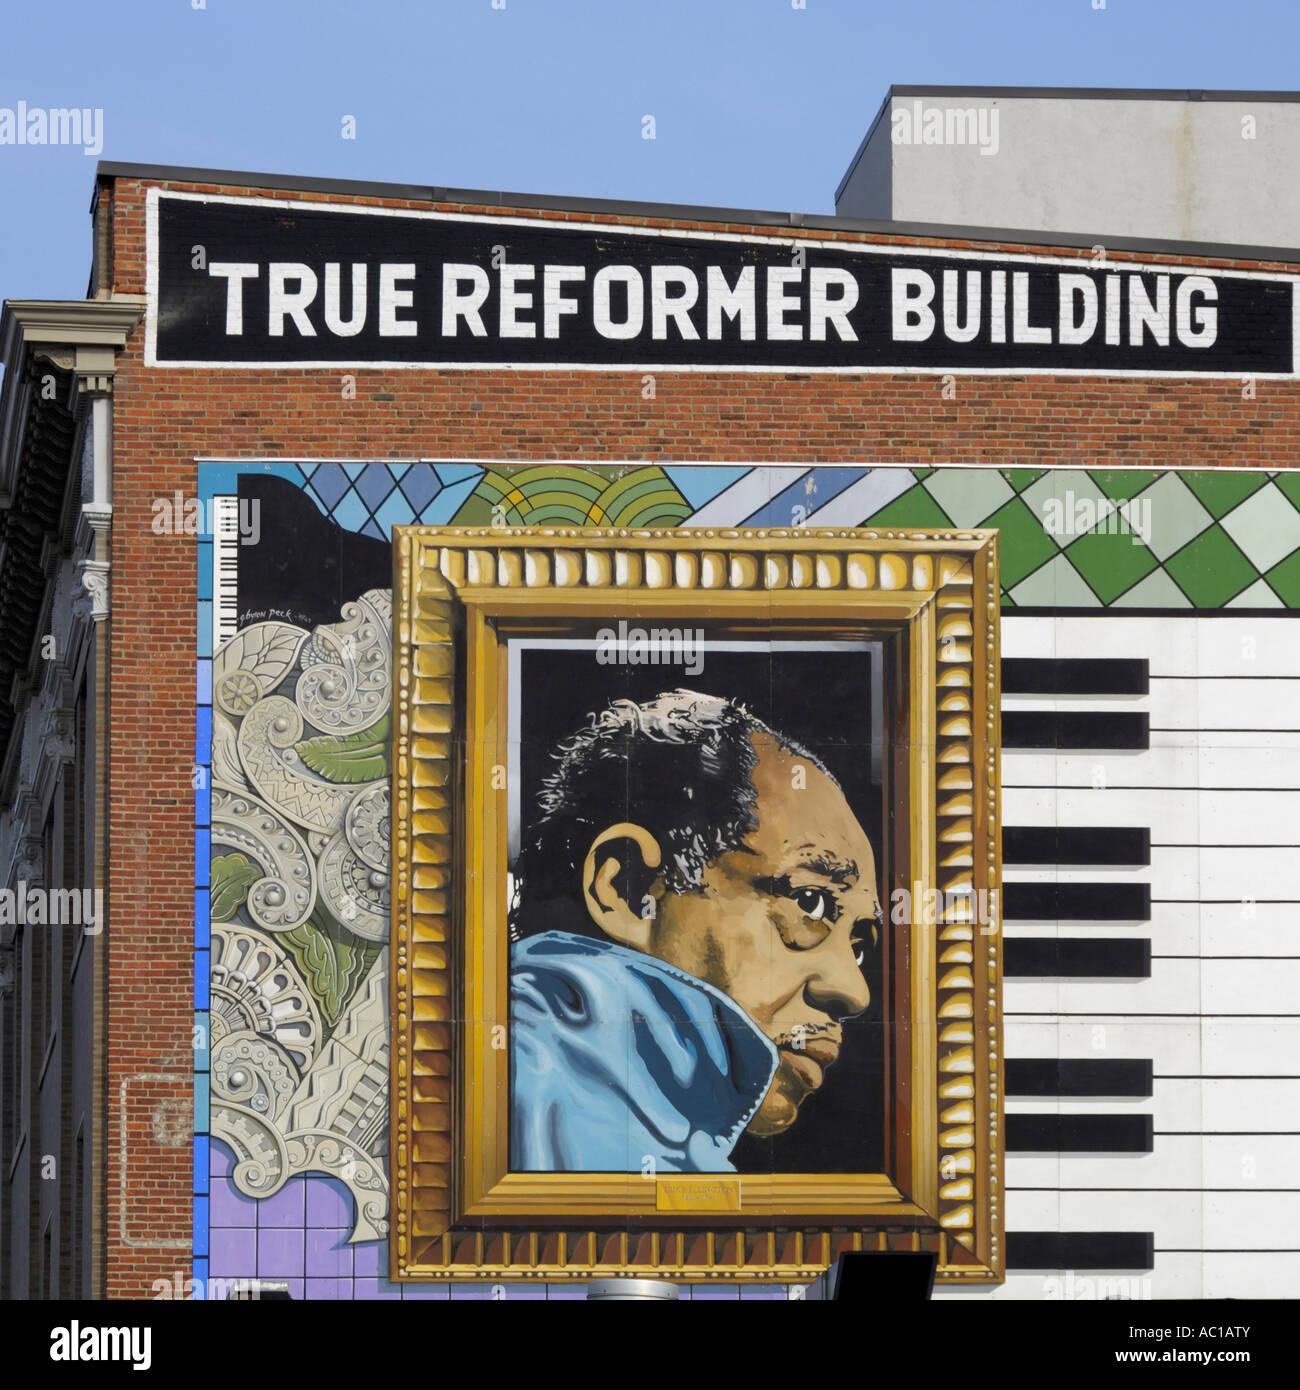 Mural on True reformer building U Street Washington DC USA - Stock Image